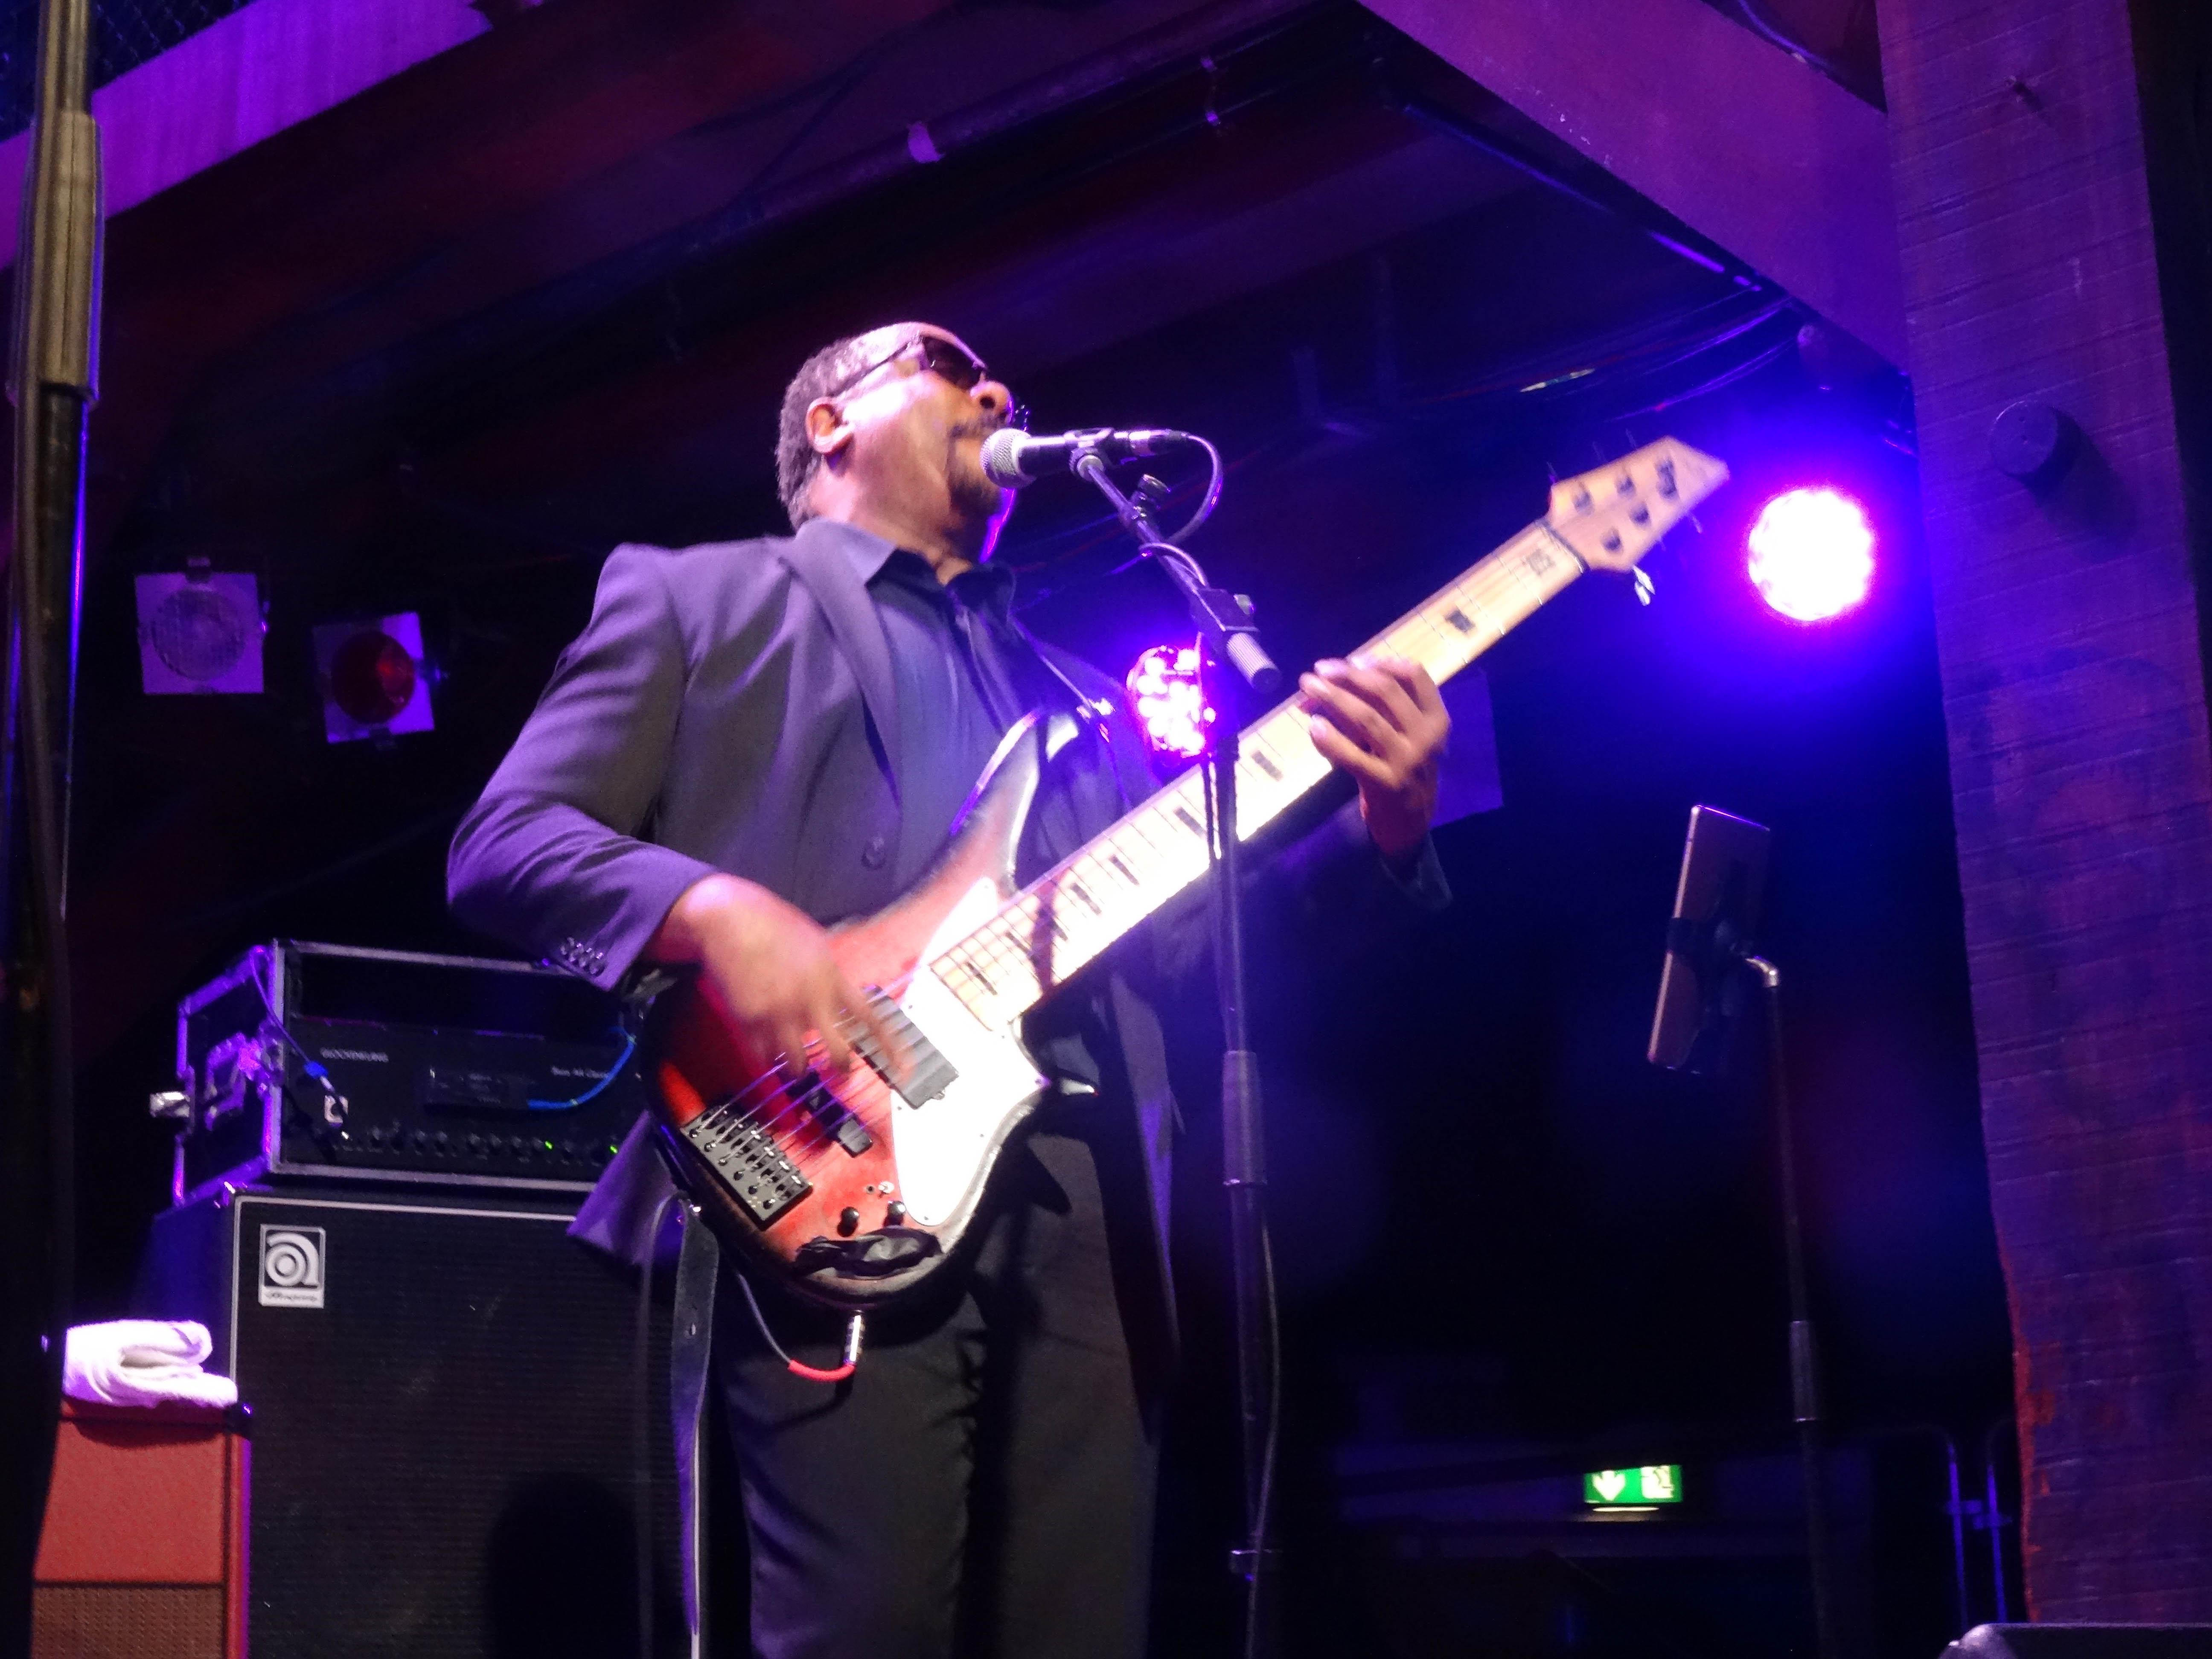 Bassist Reggie Worthy